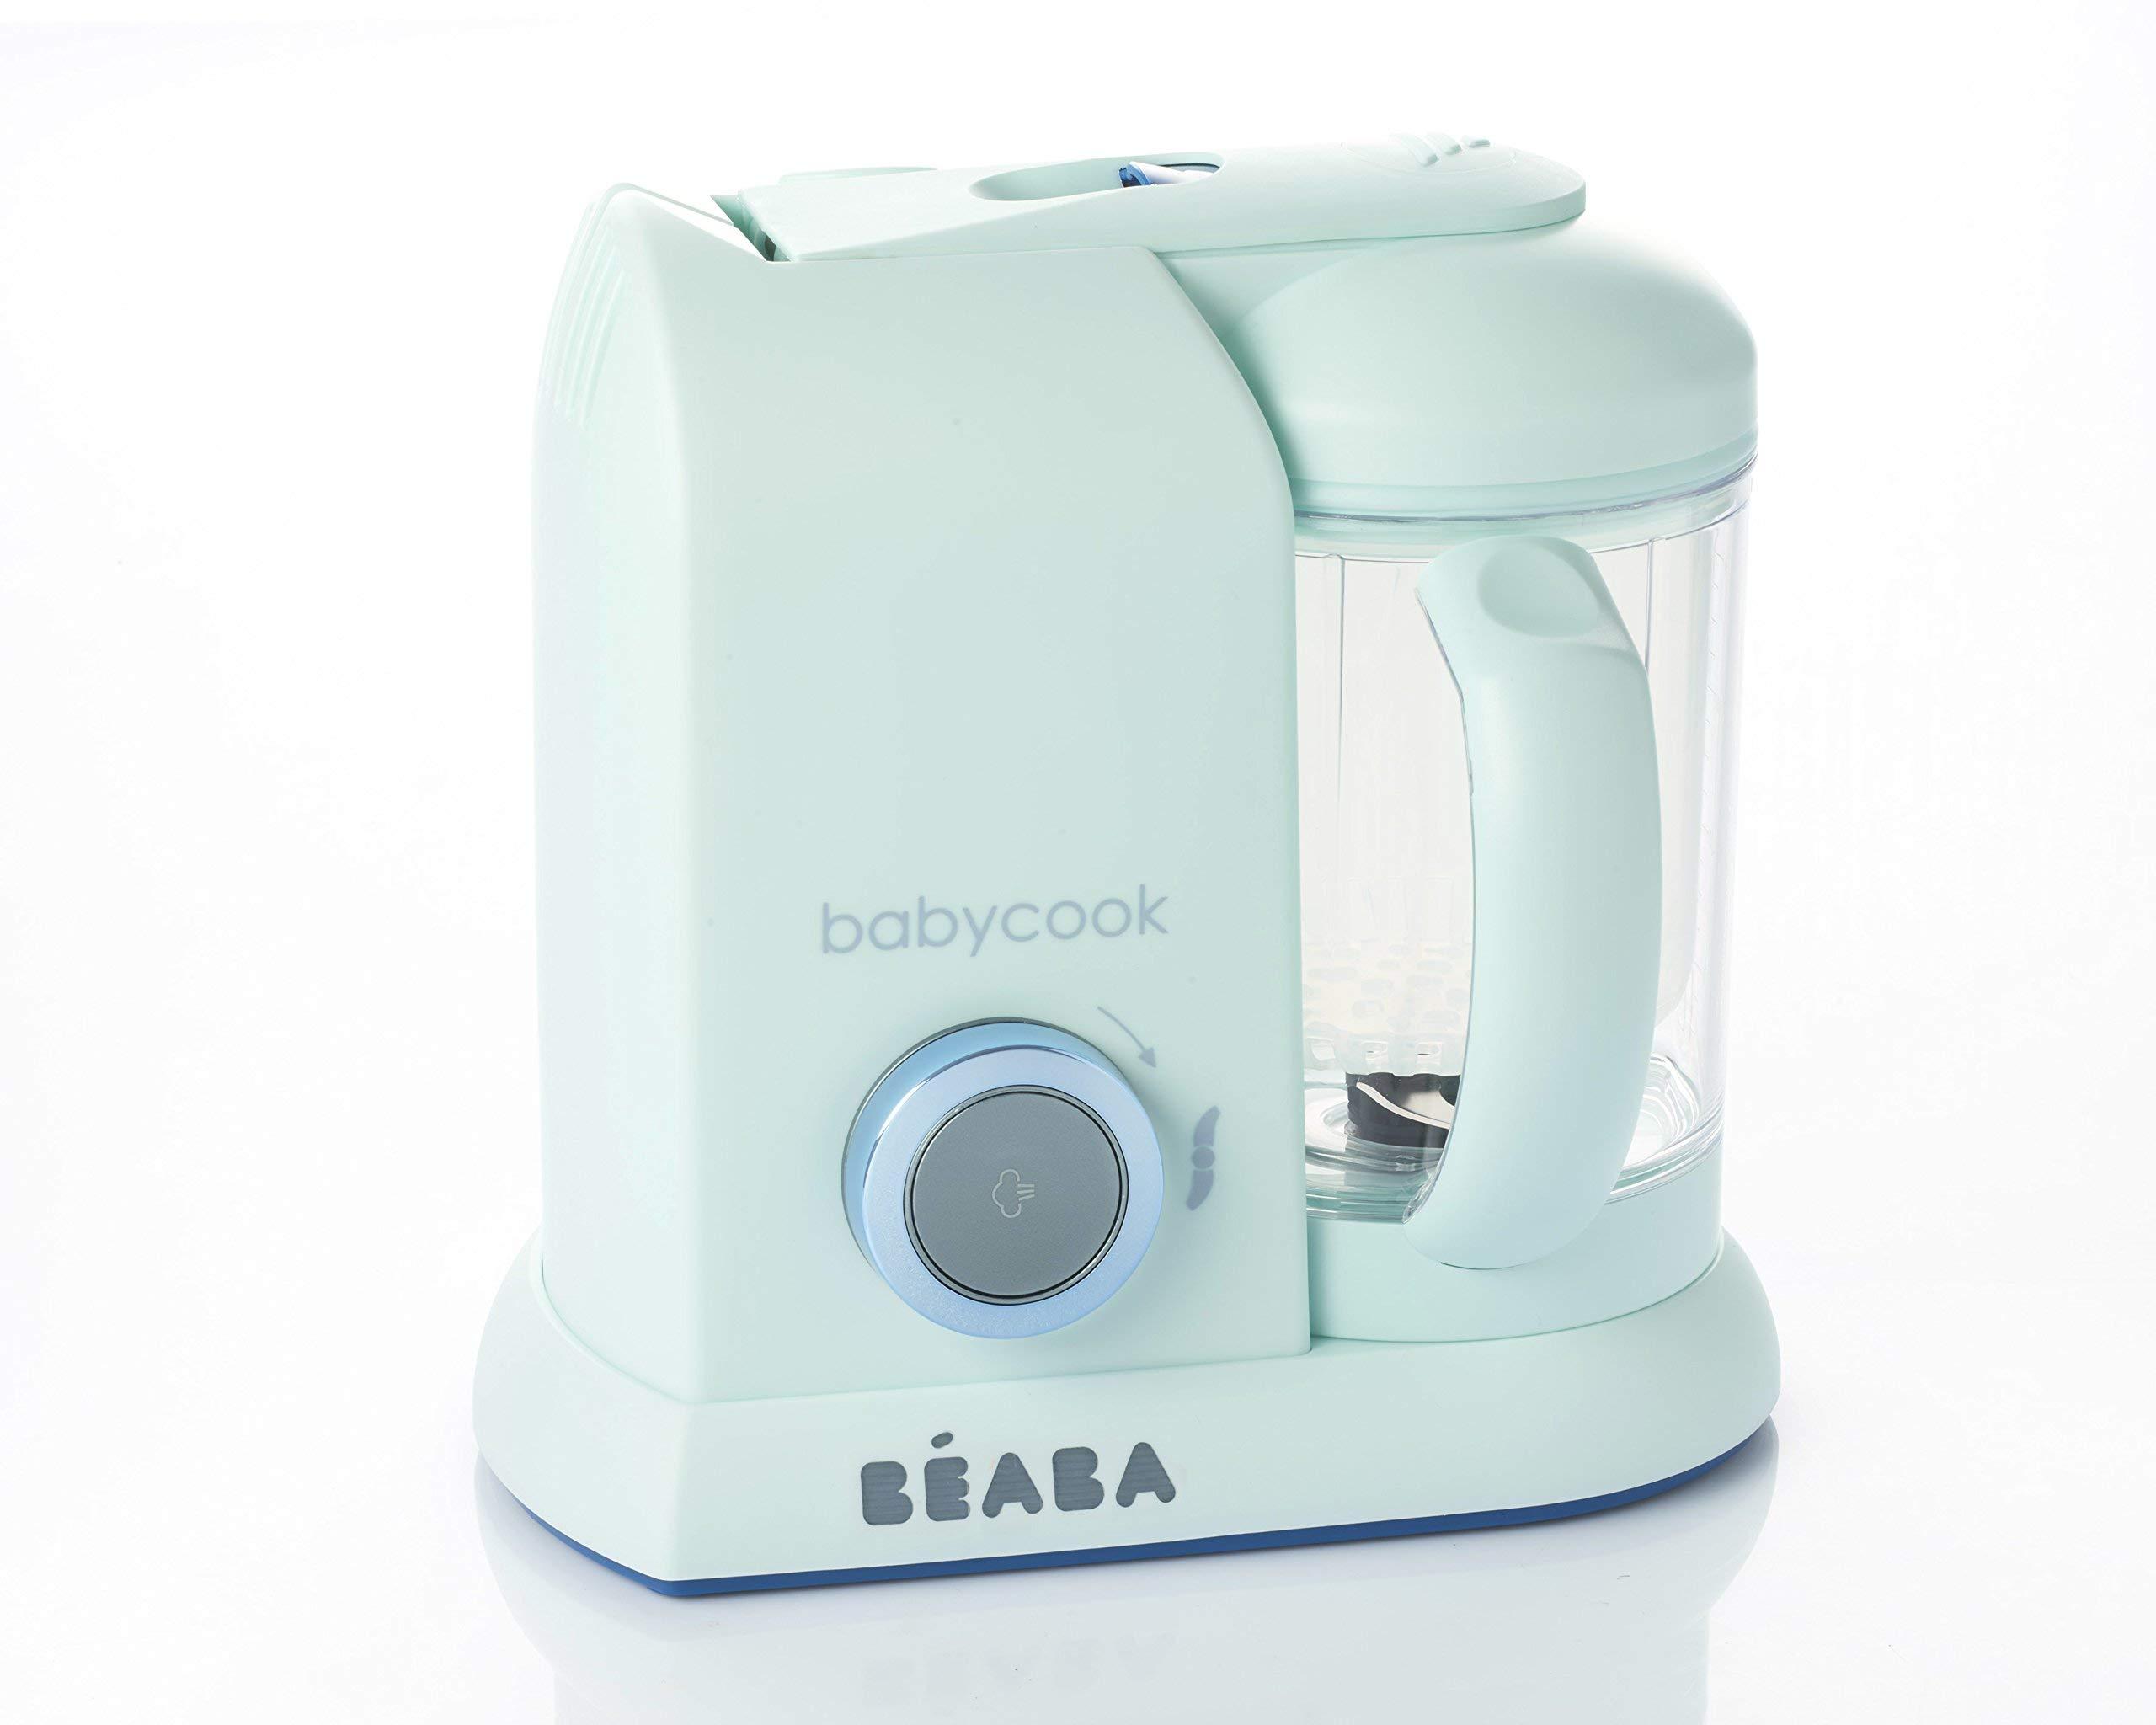 BEABA Babycook - Red (Certified Refurbished) by Beaba